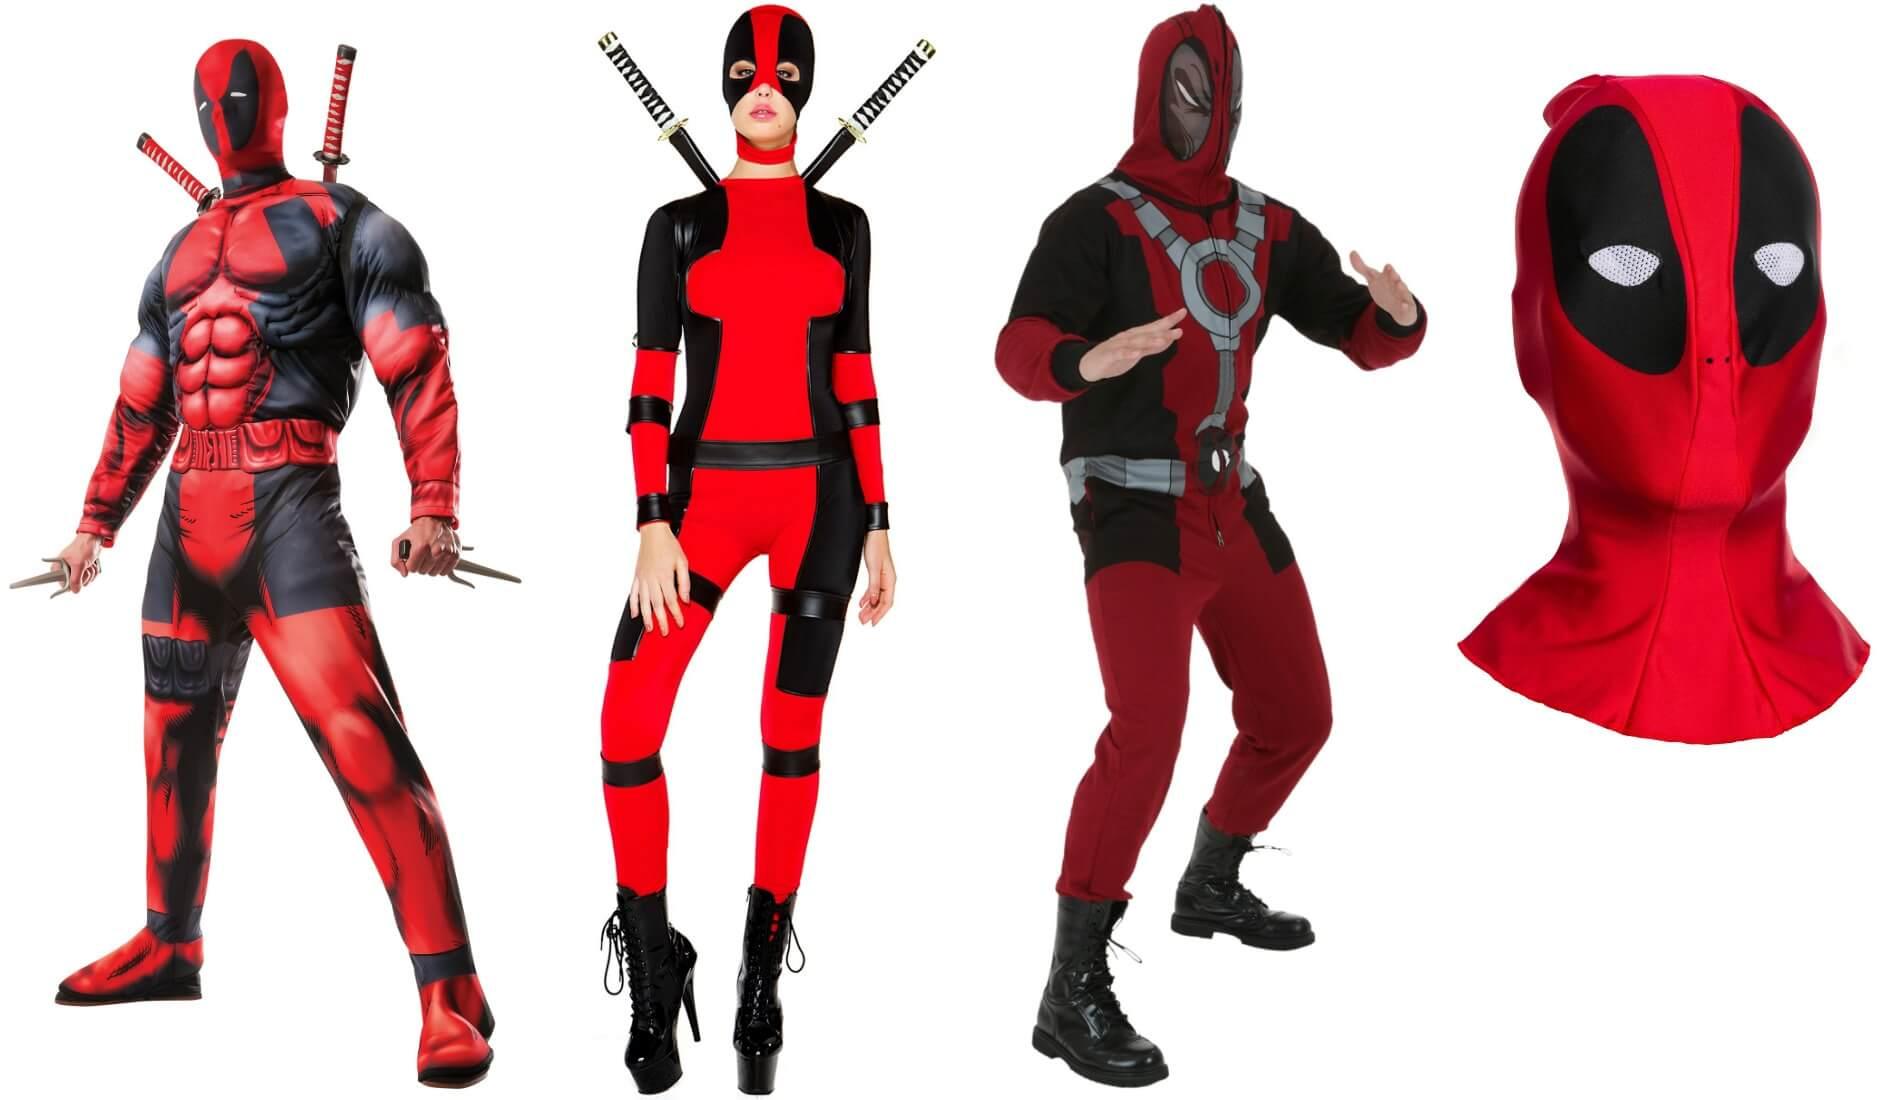 Halfway to halloween costume ideas for 2016 halloween costumes blog deadpool costumes solutioingenieria Images